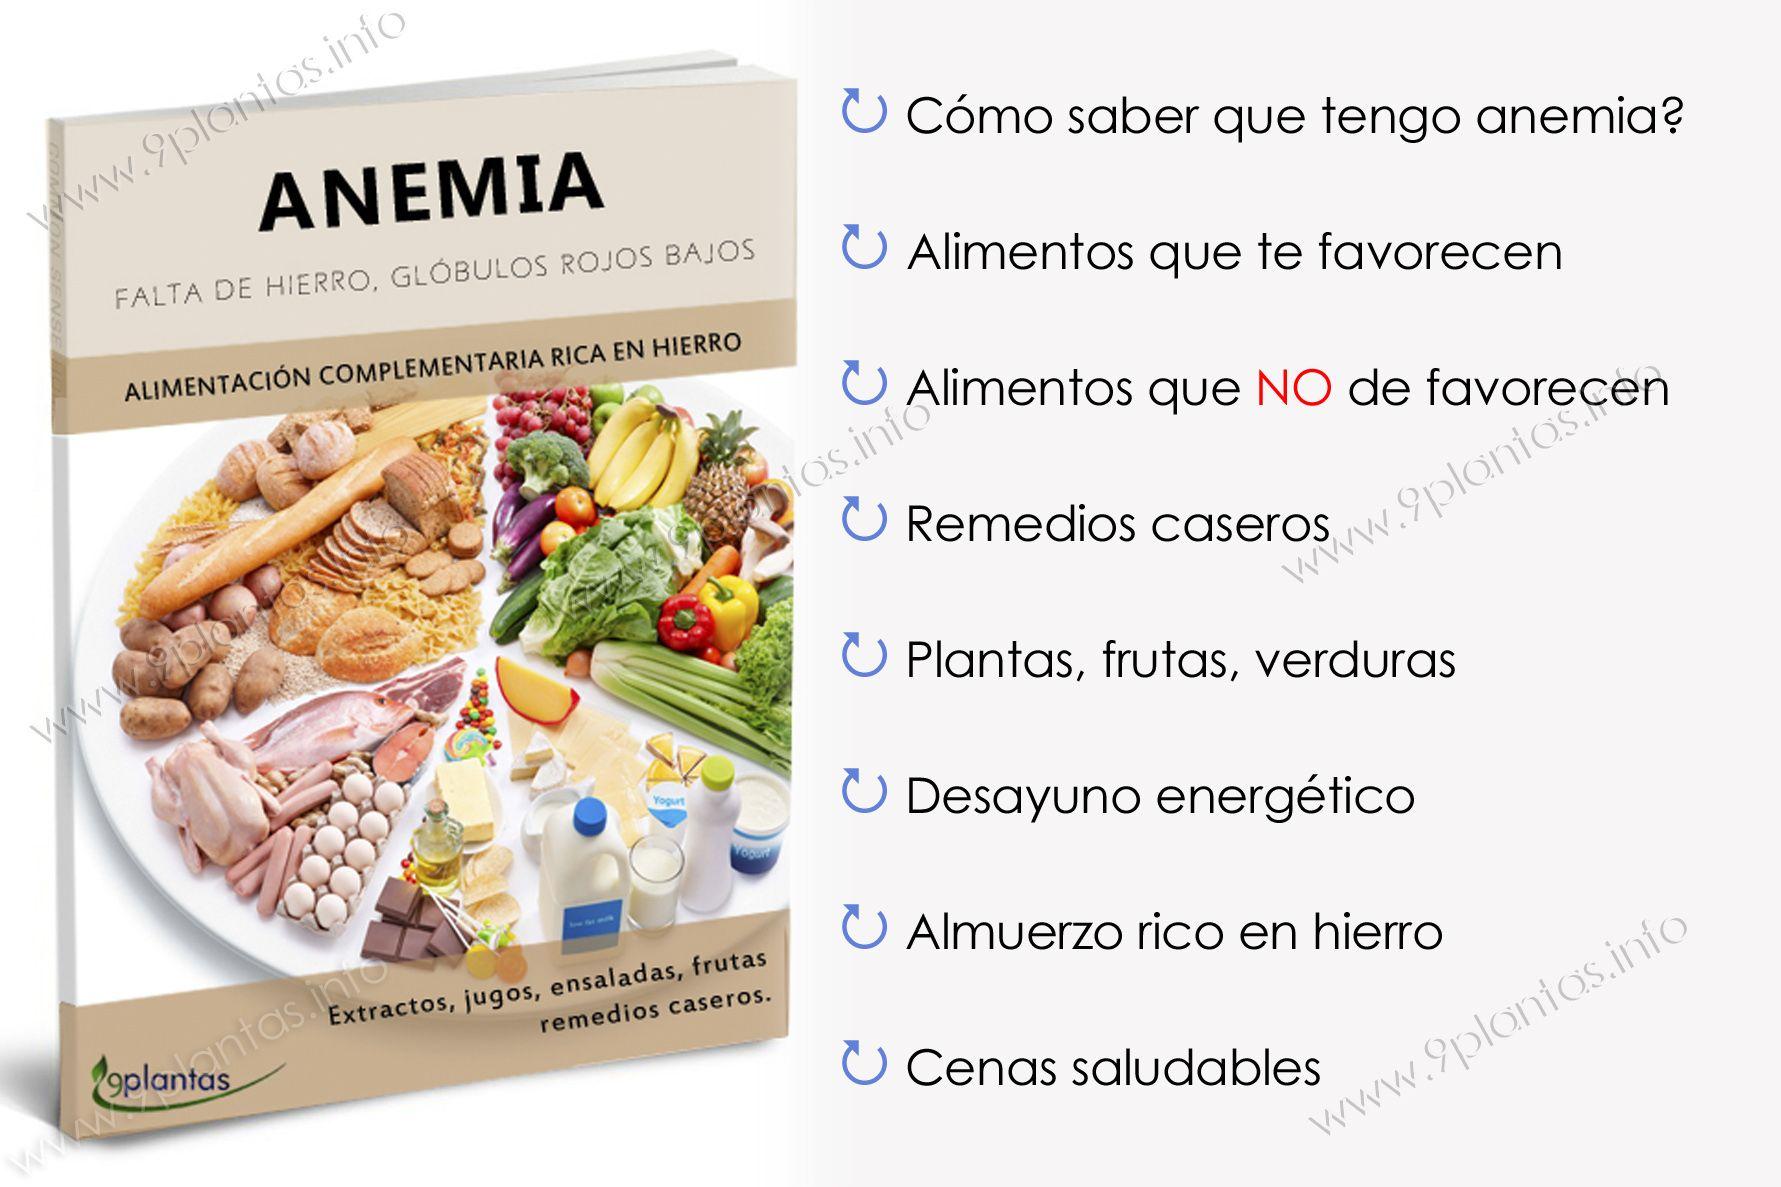 E-book | anemia, falta de hierro, disminución de glóbulos rojos